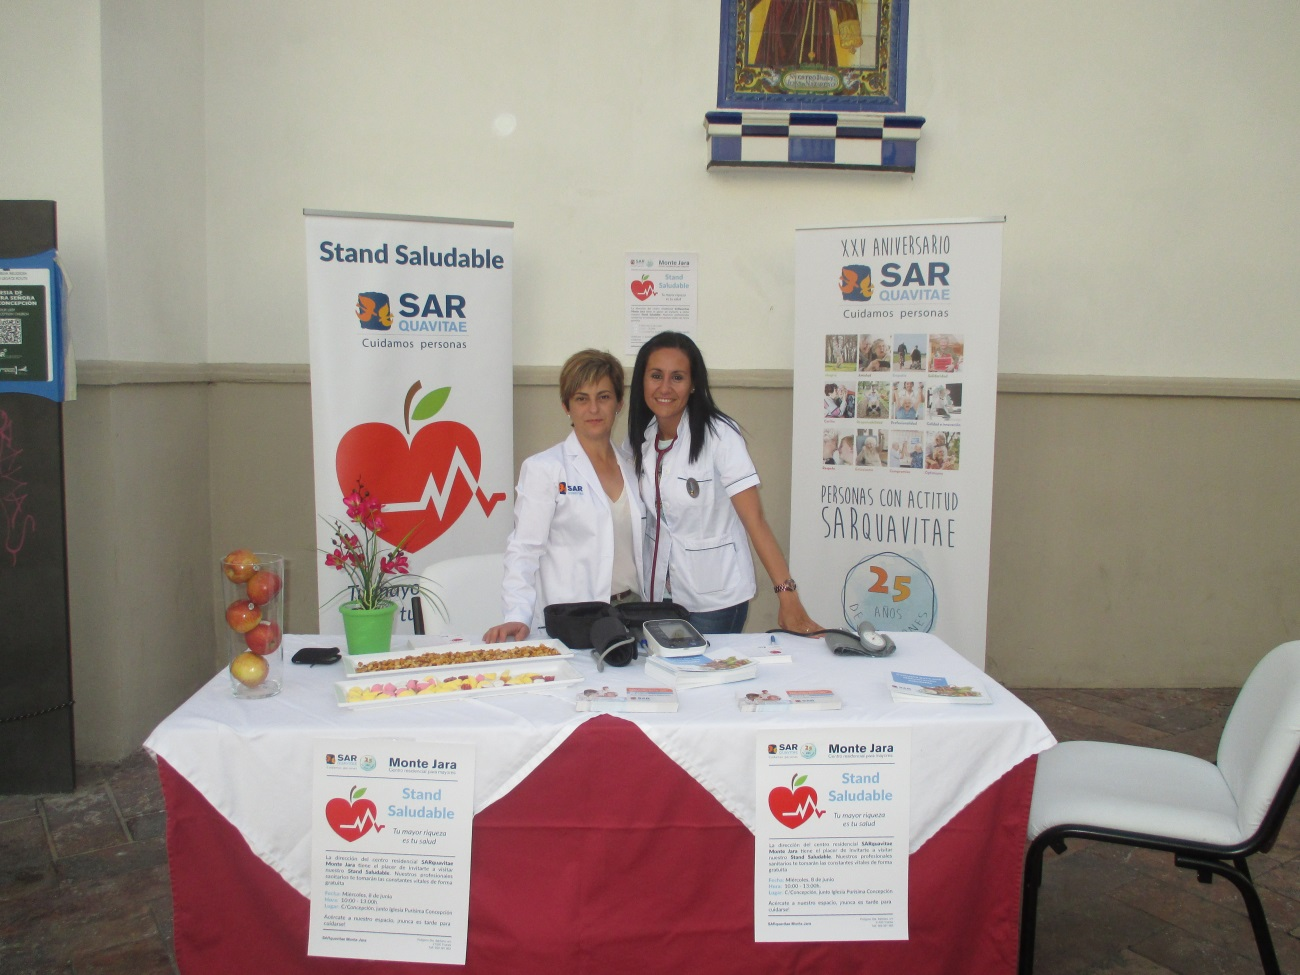 Monte Jara Stand saludable